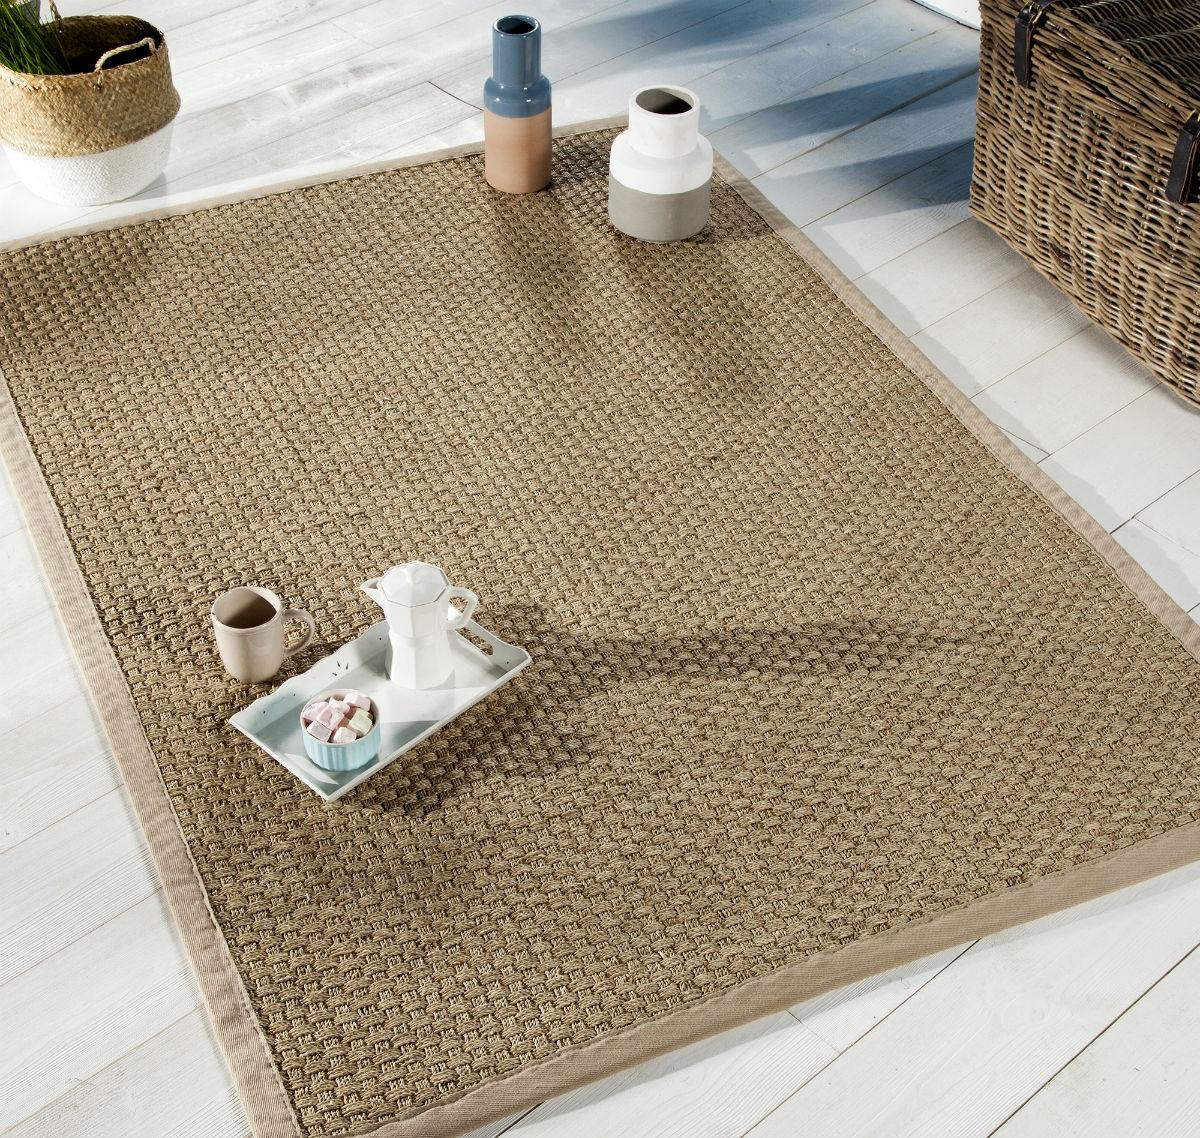 Carrelage design tapis jonc de mer moderne design pour for Tarif carrelage porcelanosa